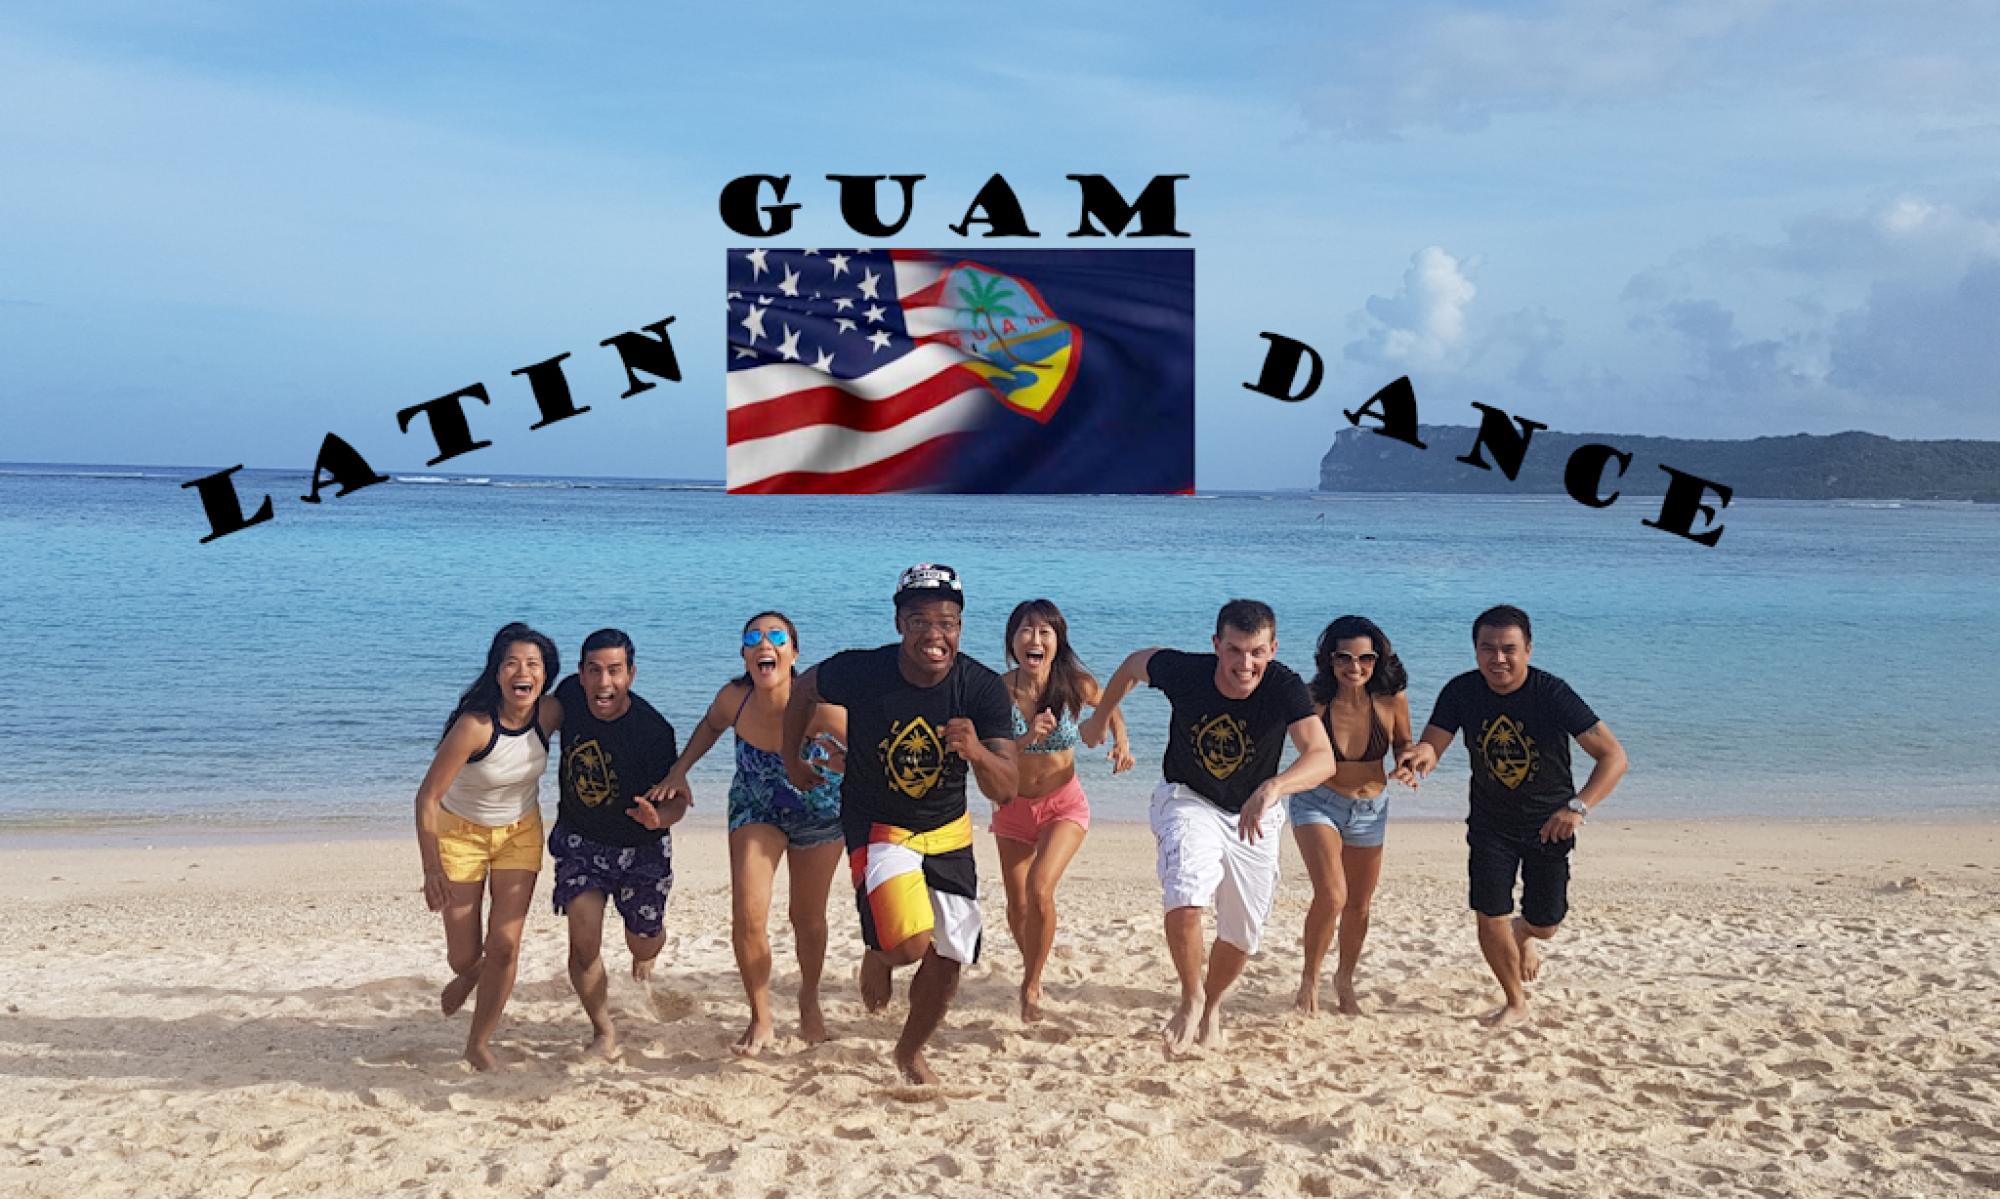 GUAM LATIN DANCE